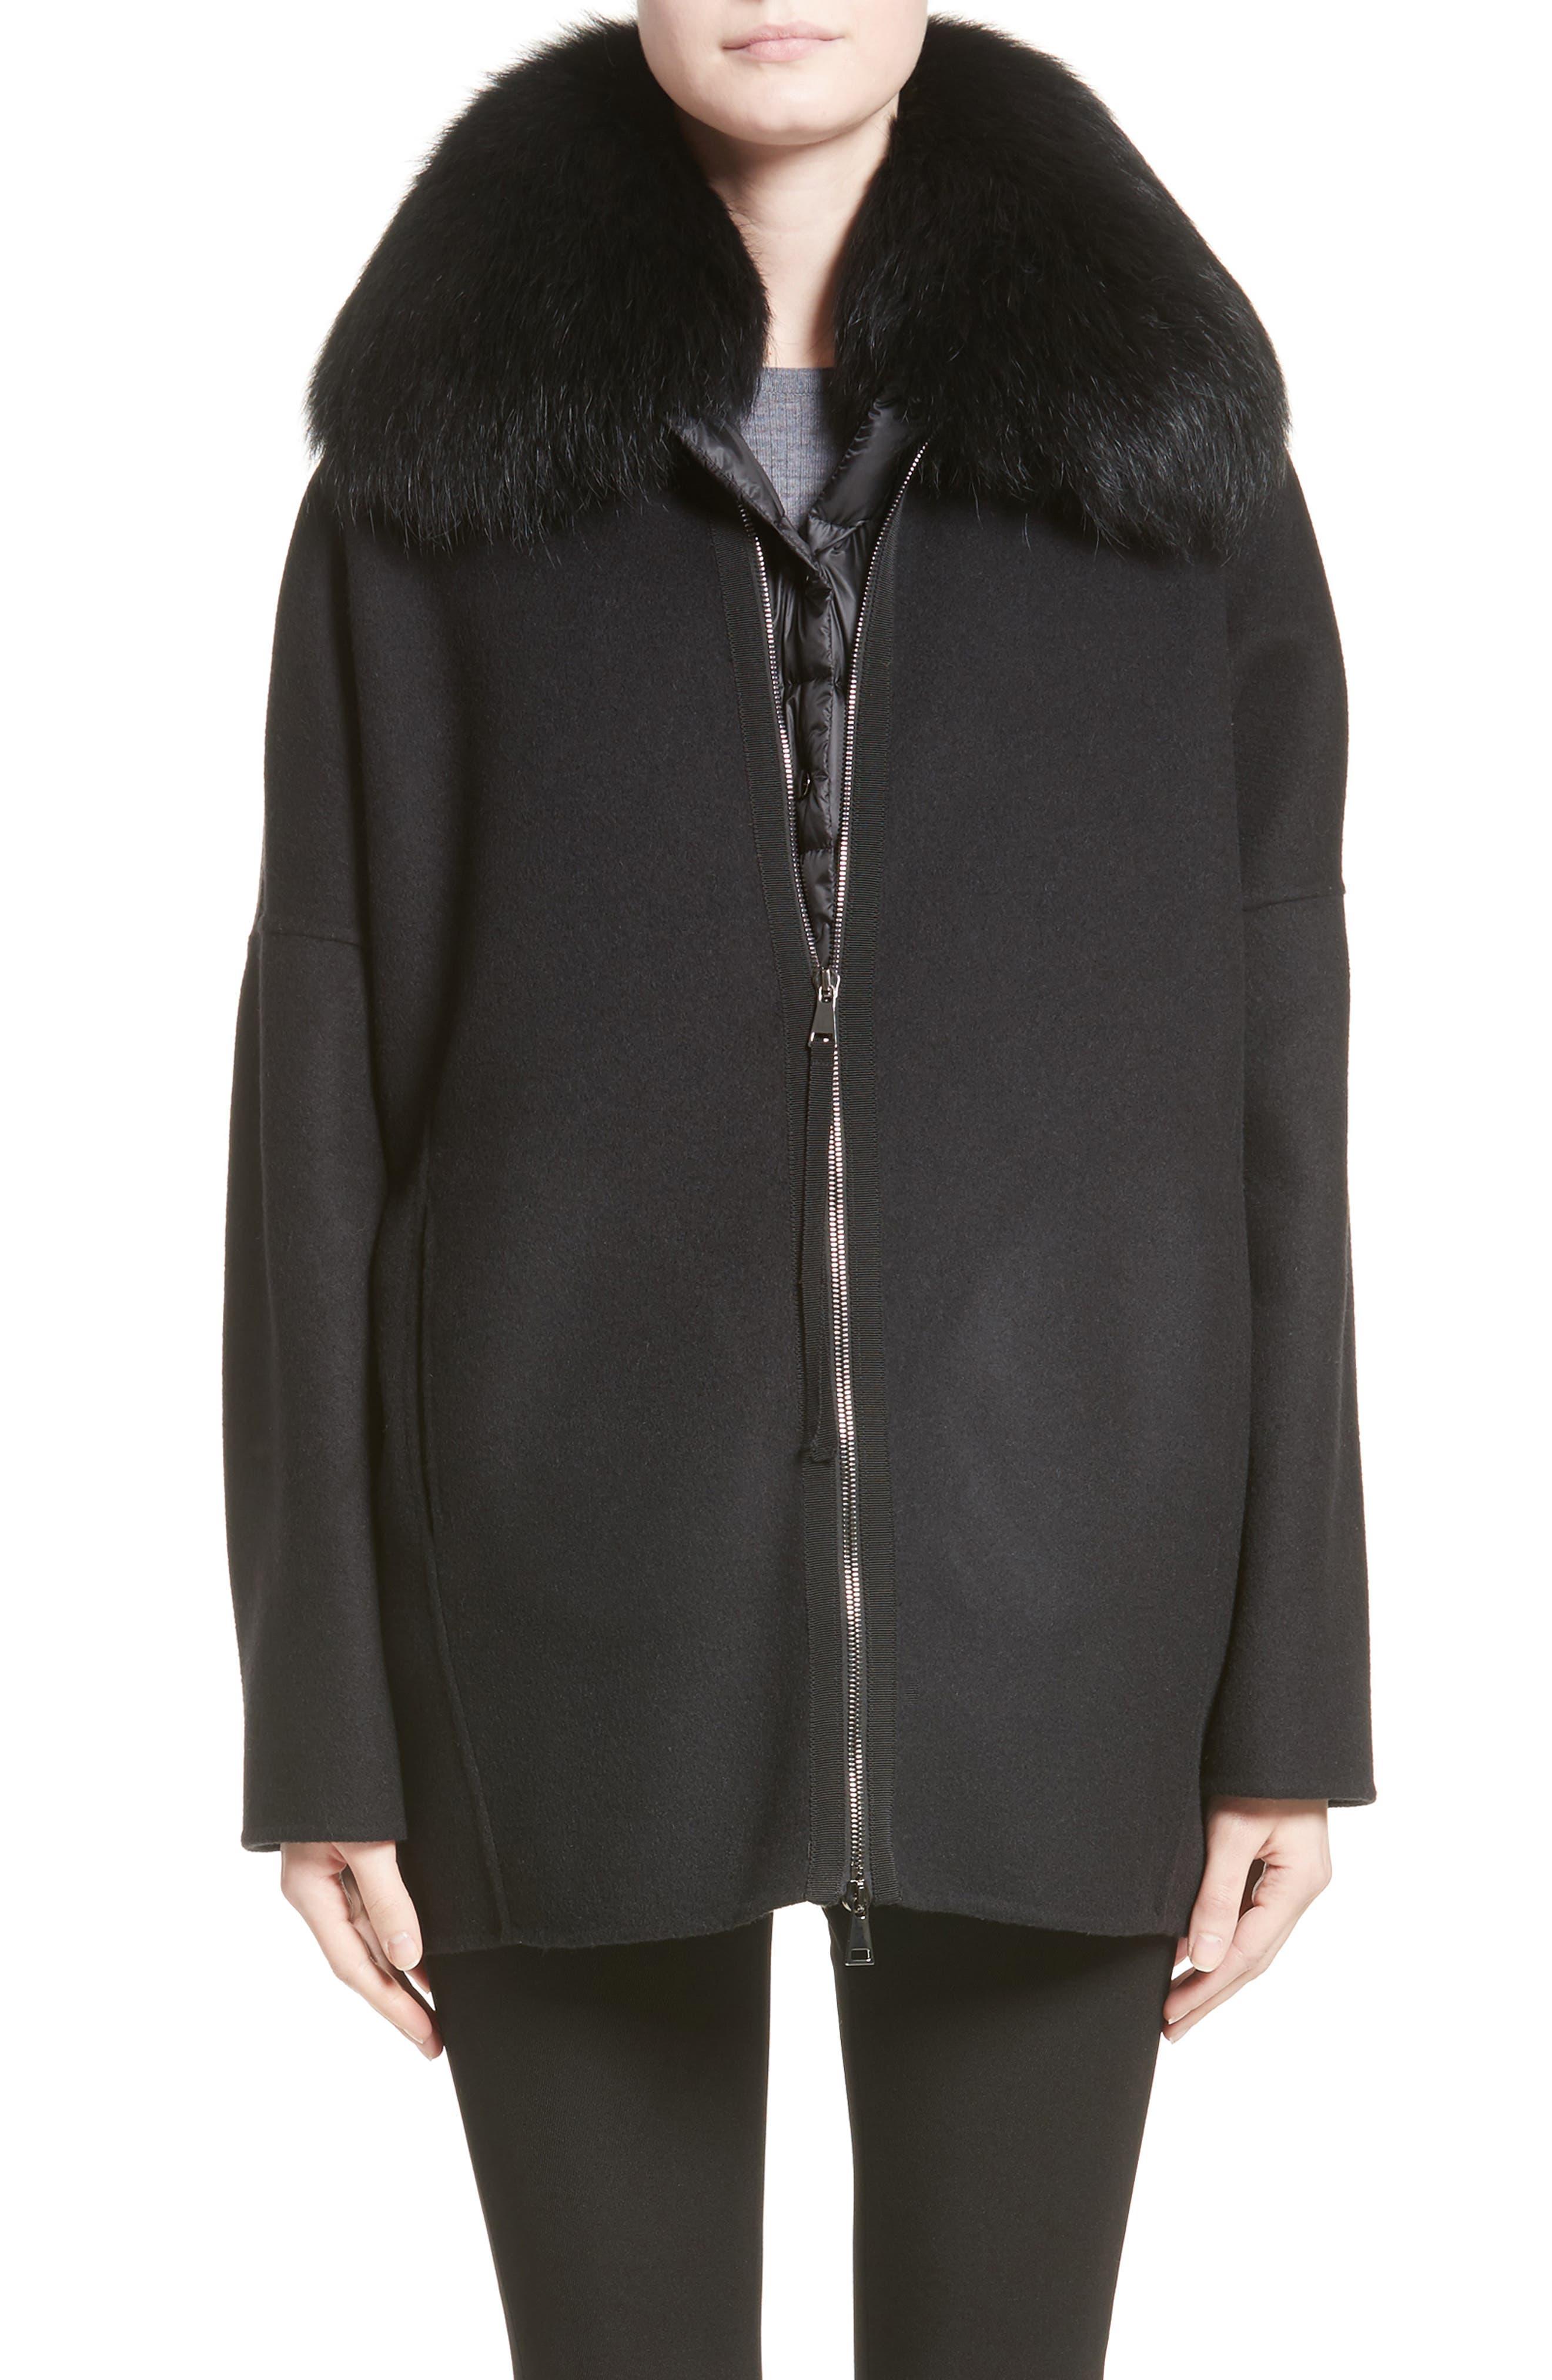 Moncler Buxus Wool & Cashmere Coat with Removable Genuine Fox Fur Trim Vest